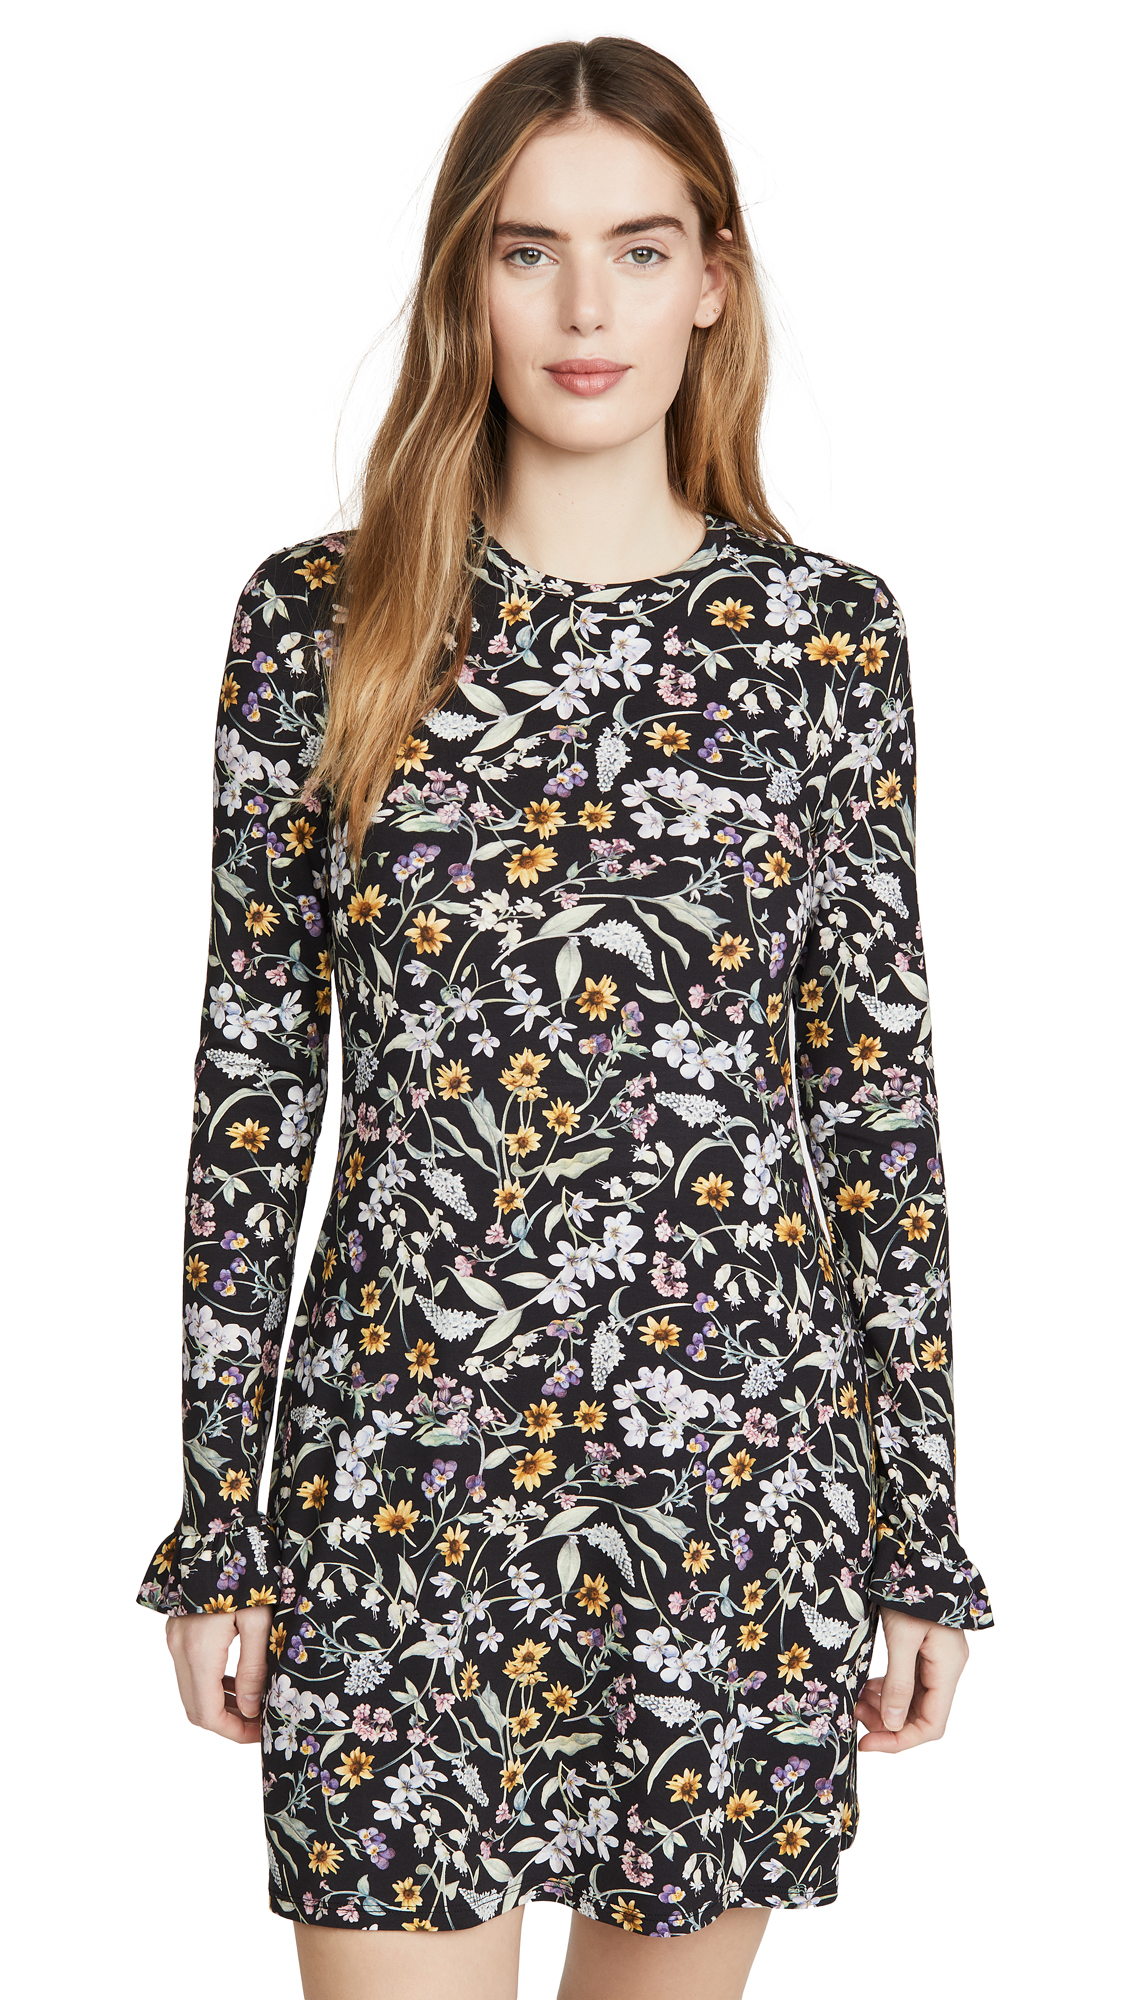 LES REVERIES Open Back Long Sleeve Mini Dress - 70% Off Sale